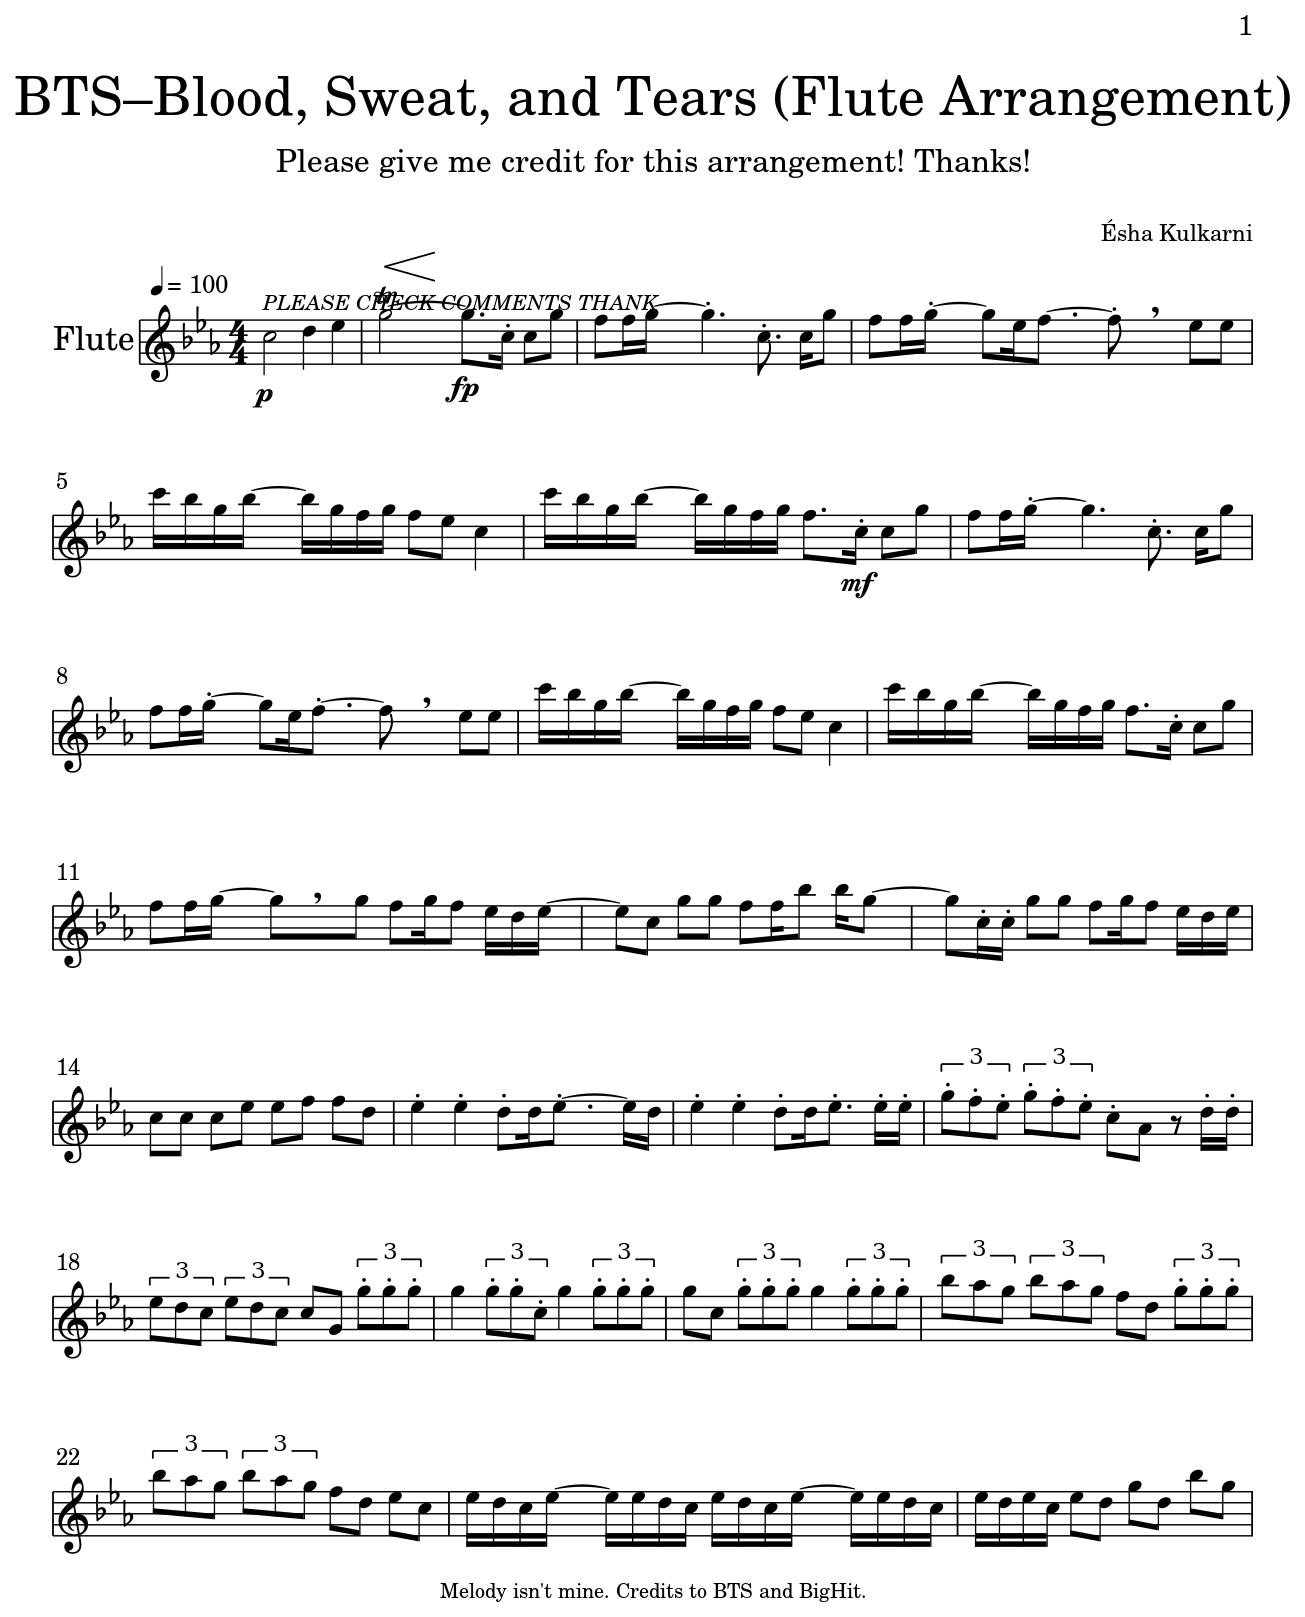 Grenade Flute Sheet Music With Lyrics: BTS–Blood, Sweat, And Tears (Flute Arrangement)